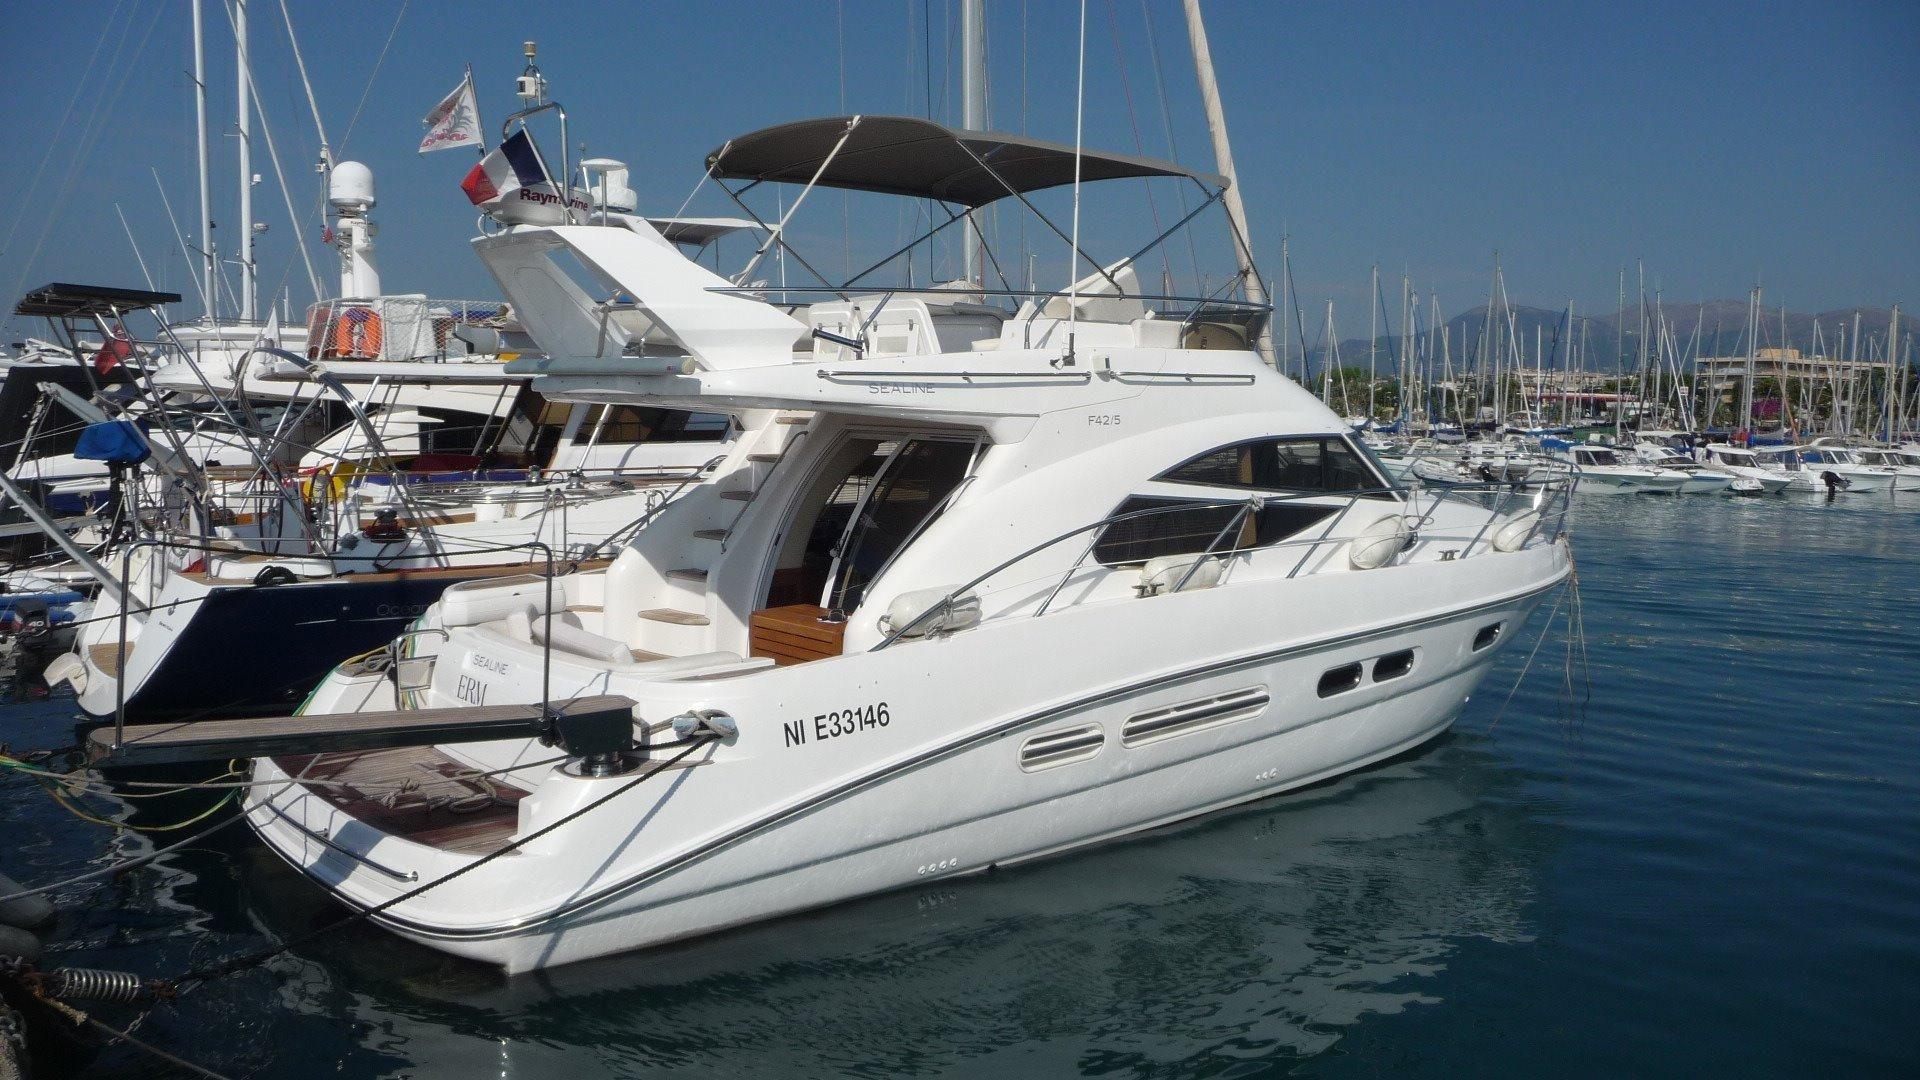 2010 Sealine 42 5 Motor Yacht For Sale Yachtworld